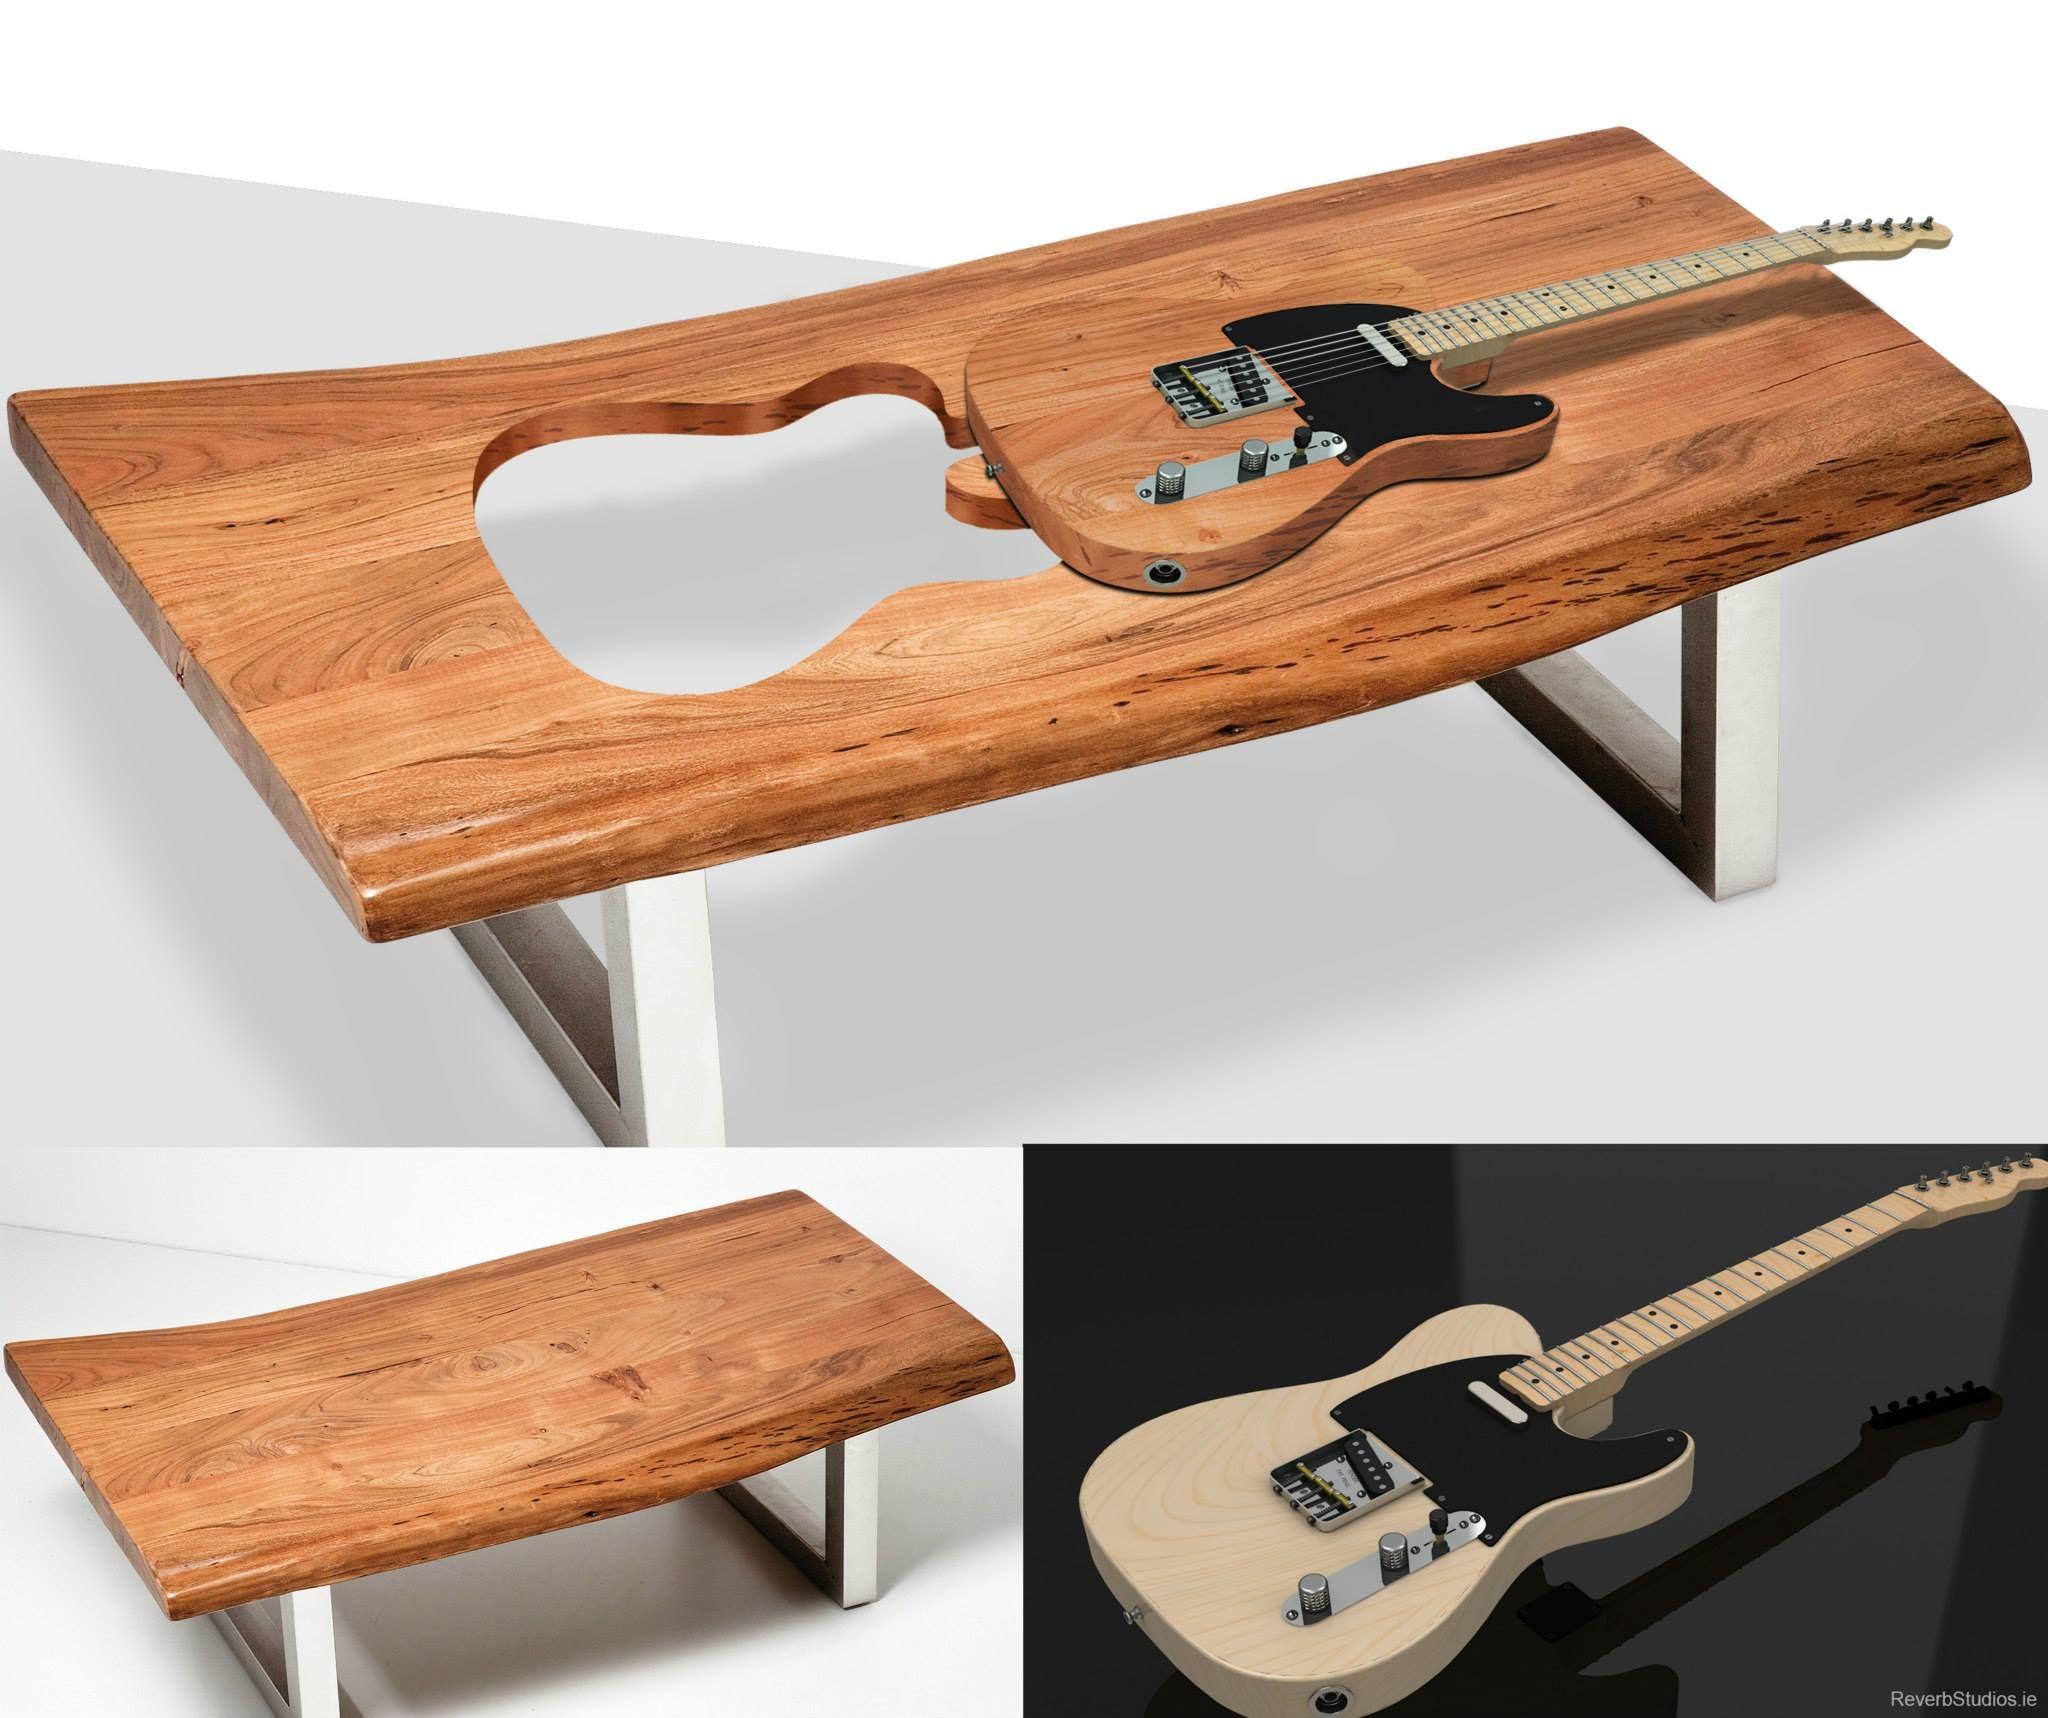 Fender Telecaster cutout